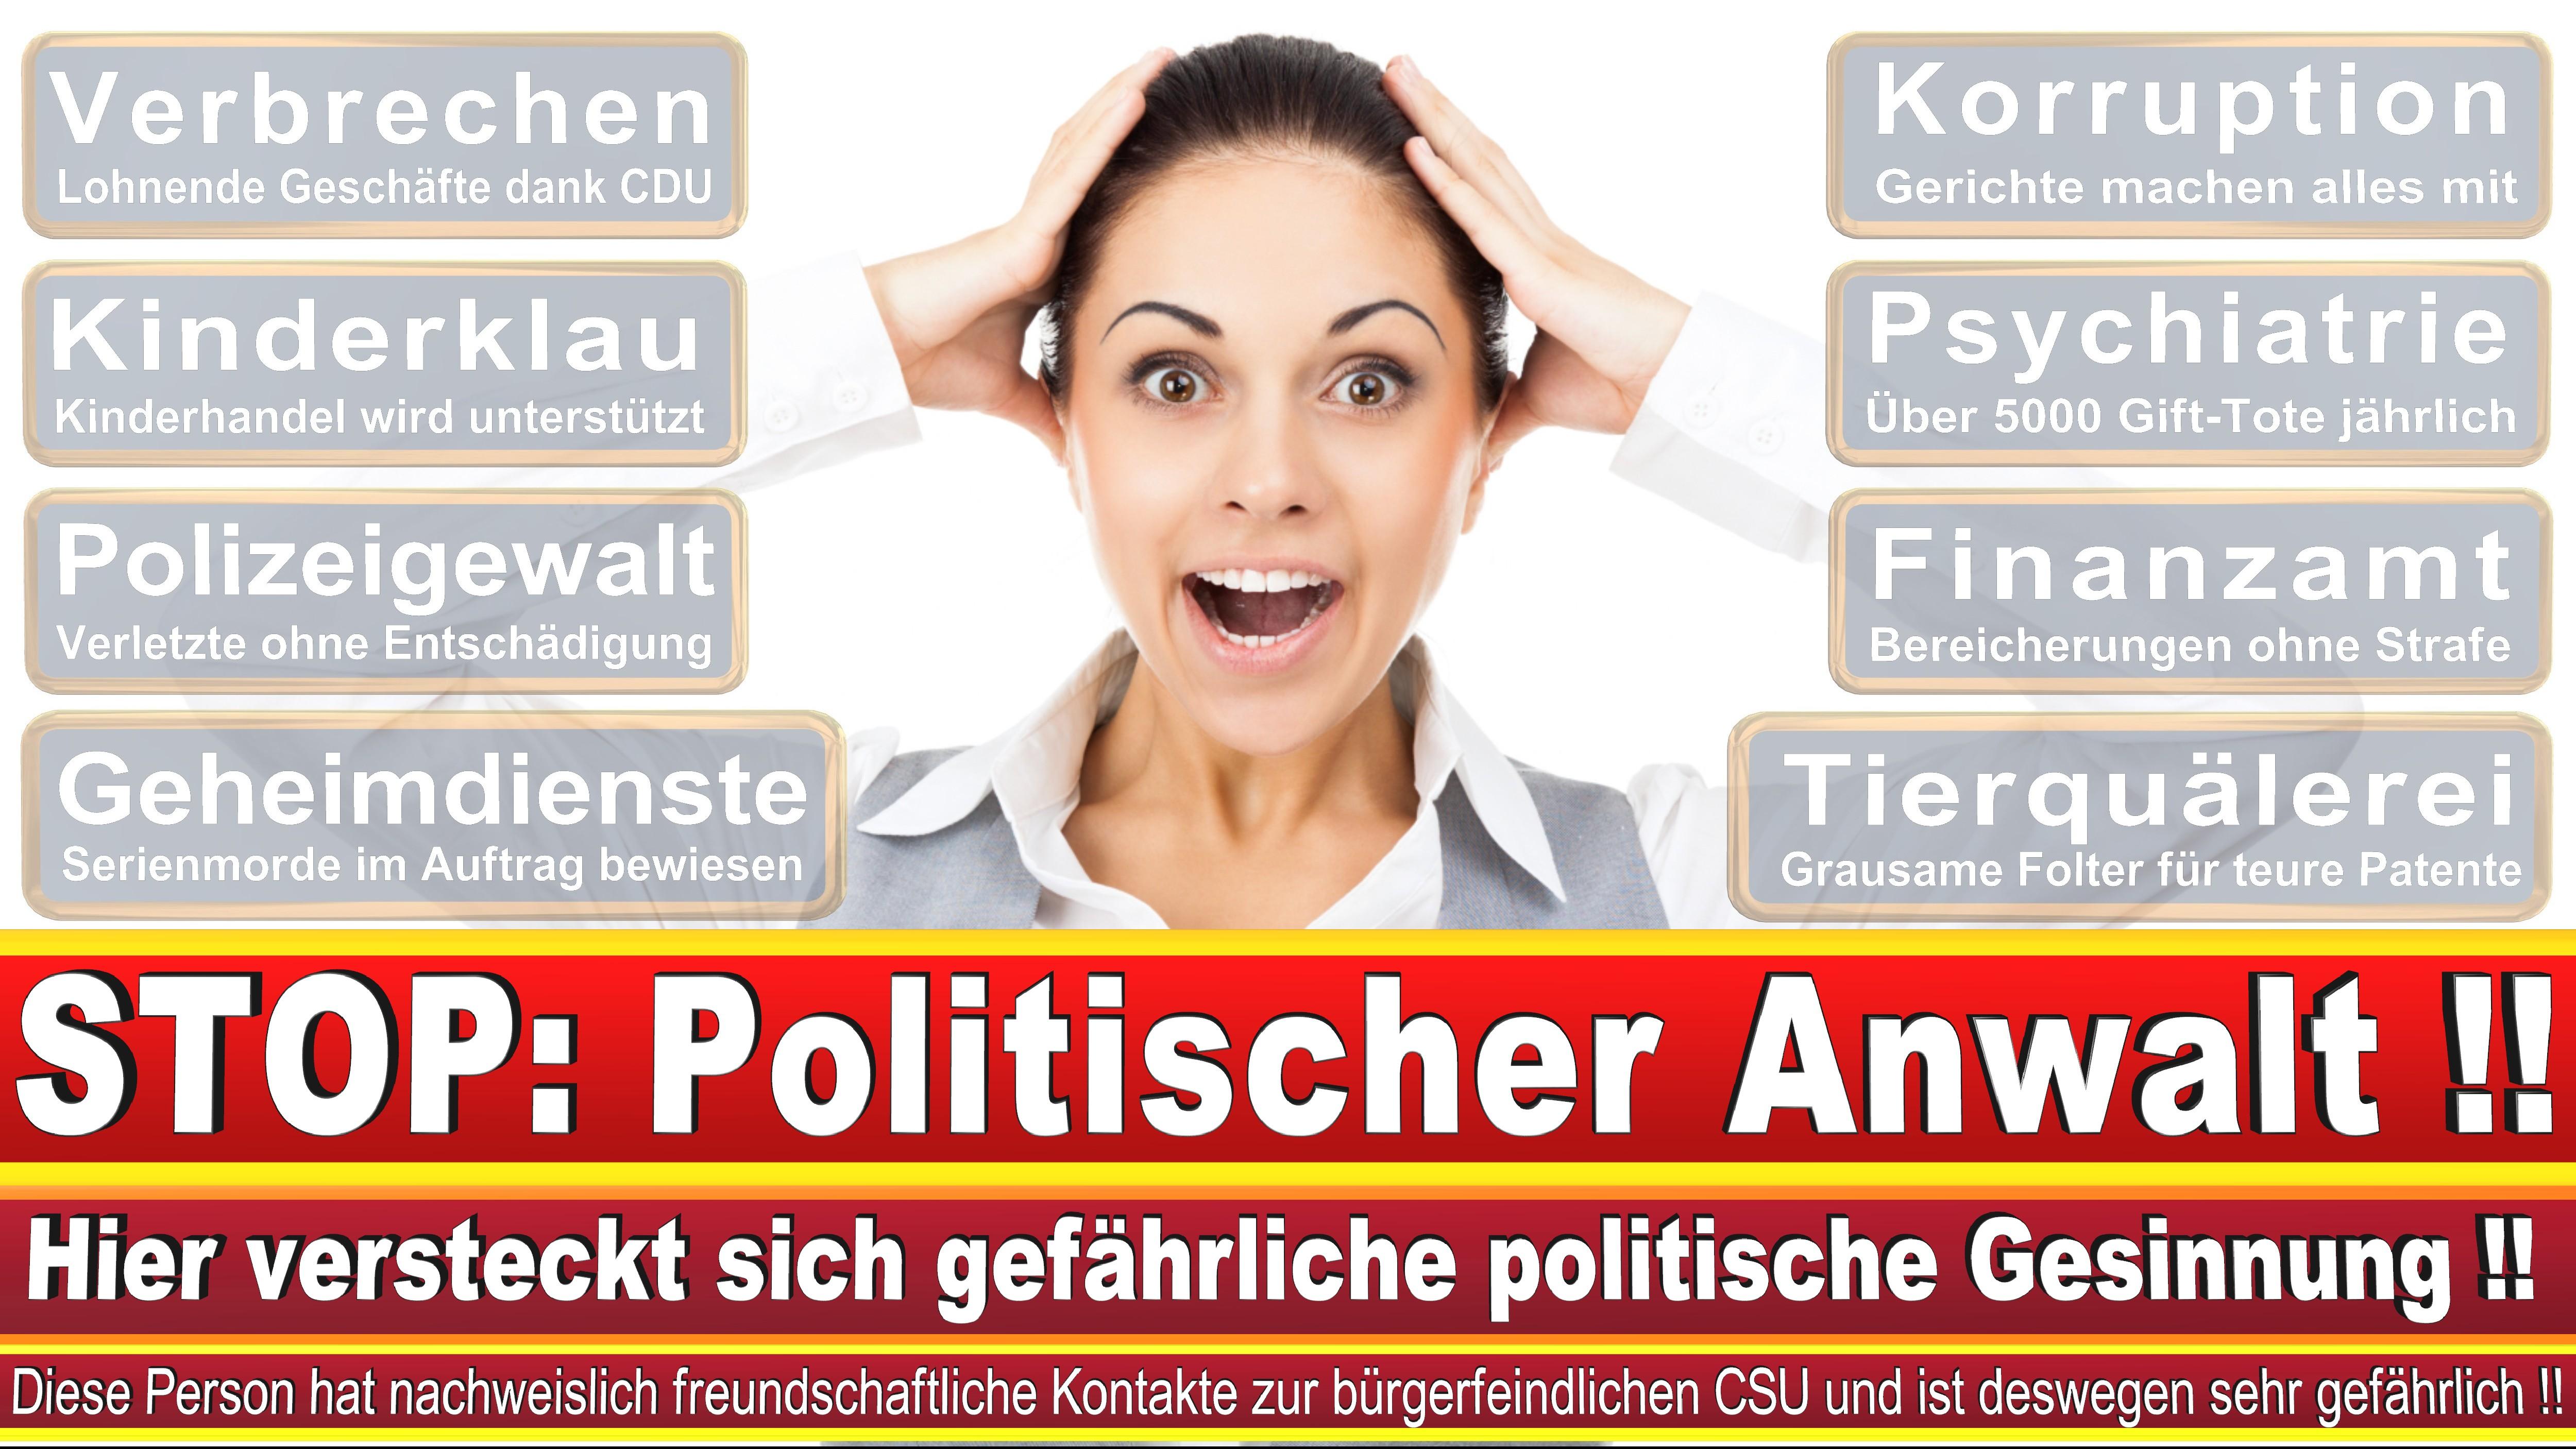 Rechtsanwalt Simon Geyer Landshut Altdorf Selbstständig Rechtsanwalt GSG Rechtsberatung Steuerberatung